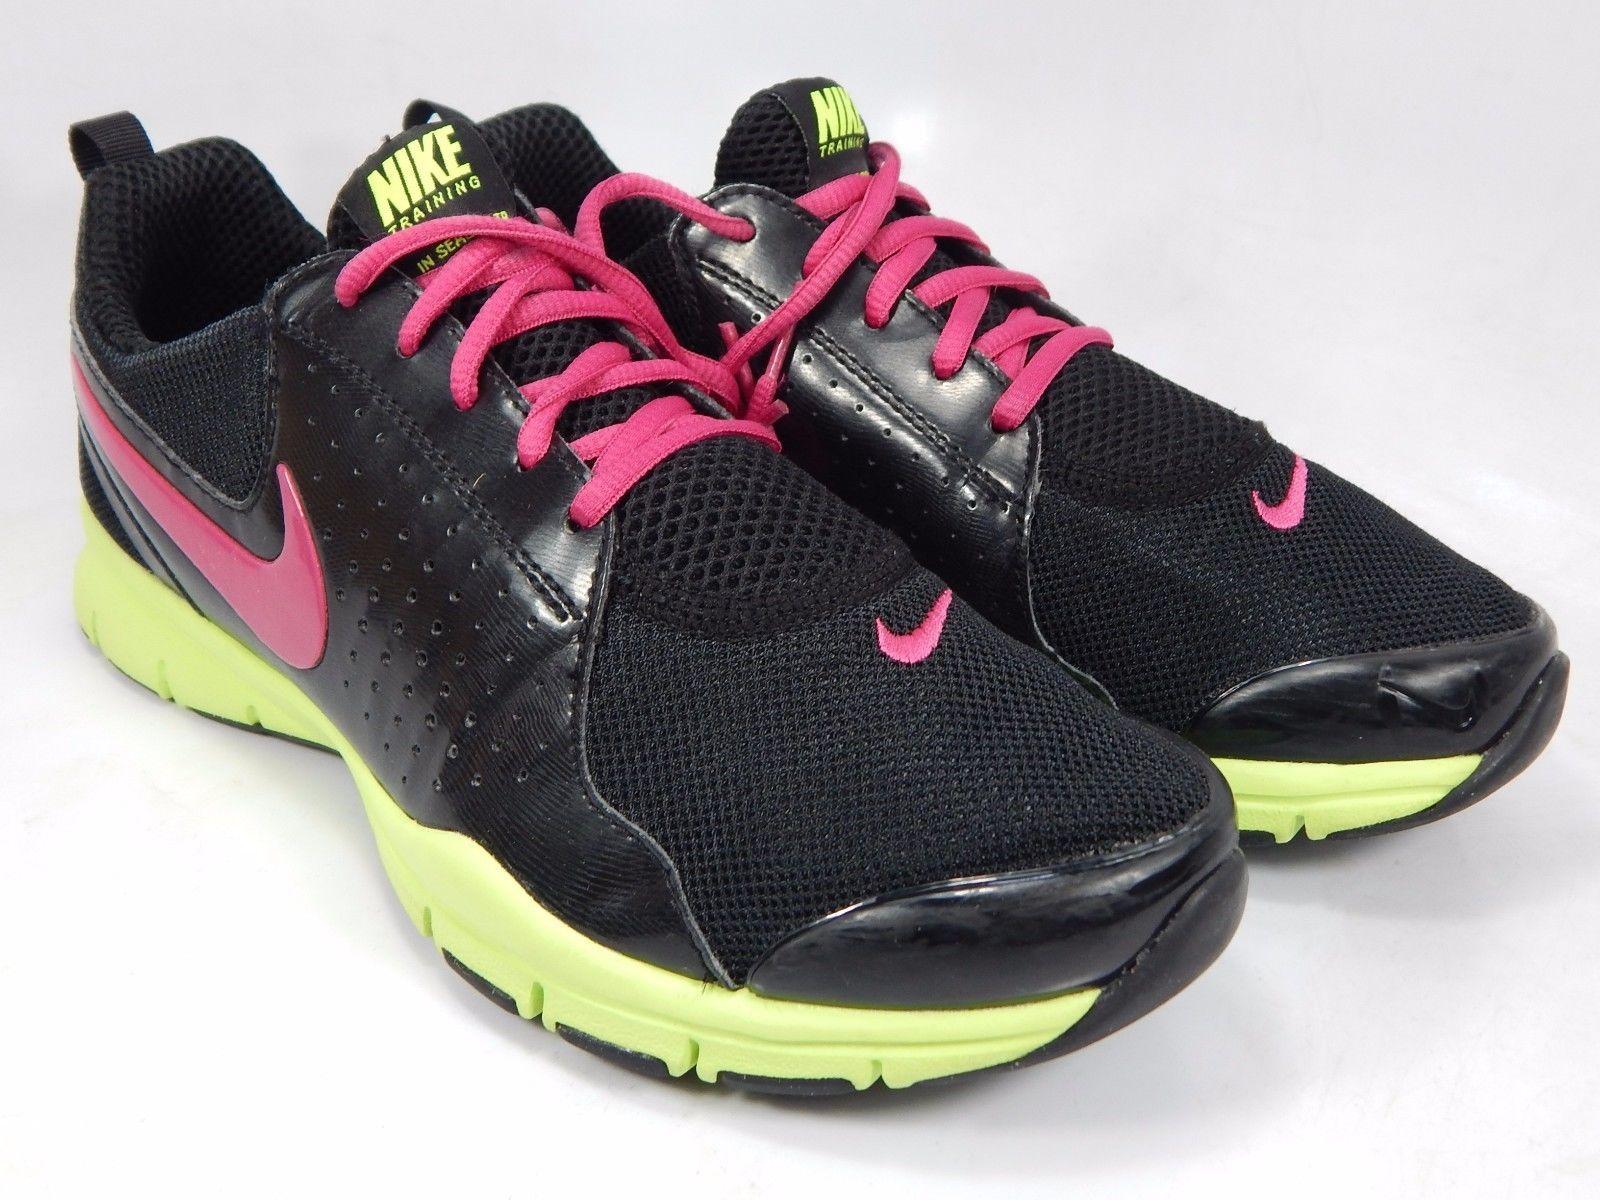 Nike IN-Season TR Training Womens Running Shoes Sz US 9 M (B) EU 40.5 454445-063